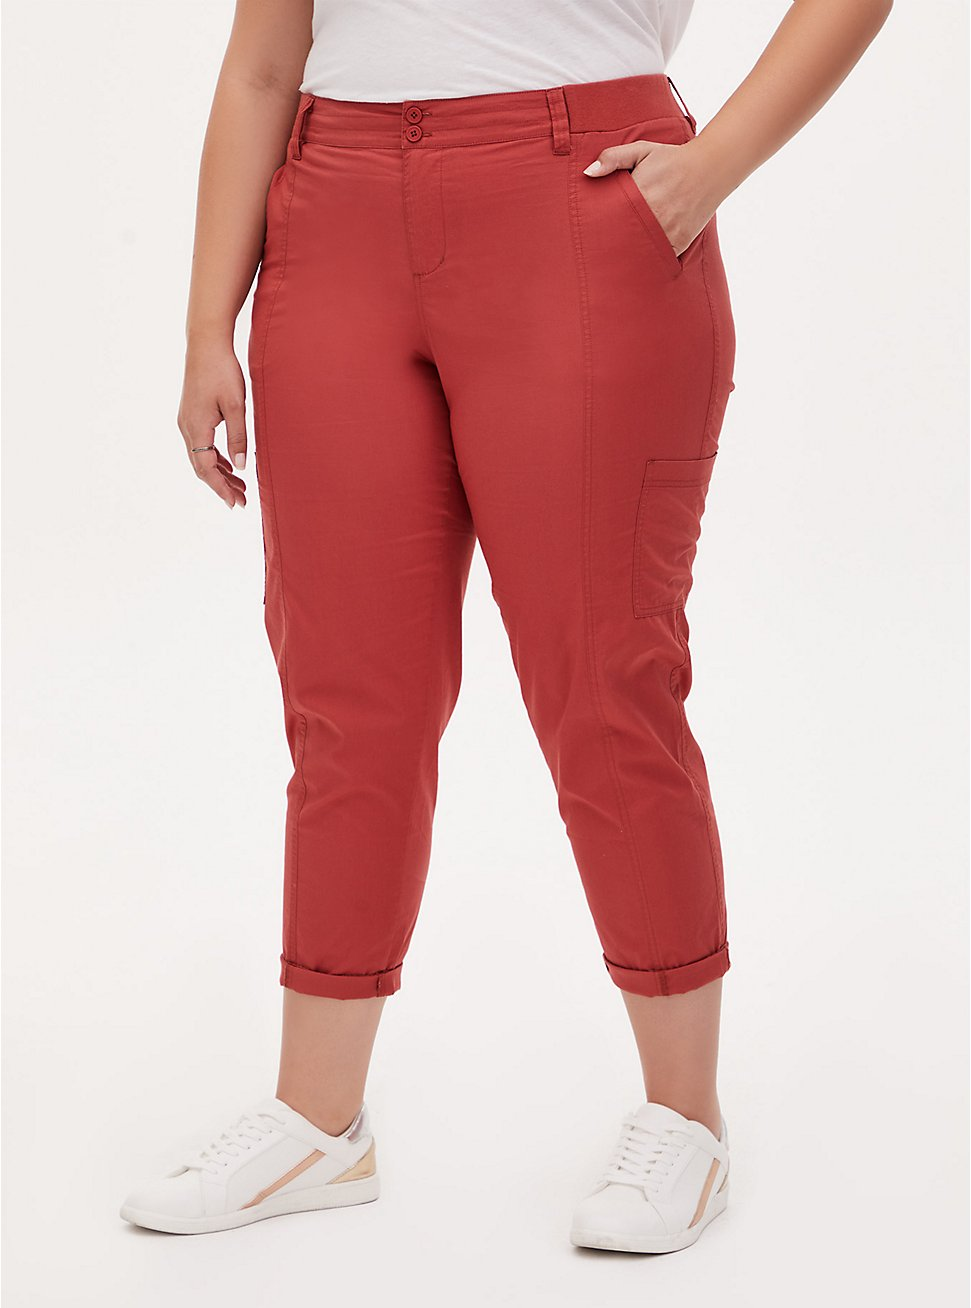 Crop Utility Pant - Poplin Red Terracotta, RED, hi-res